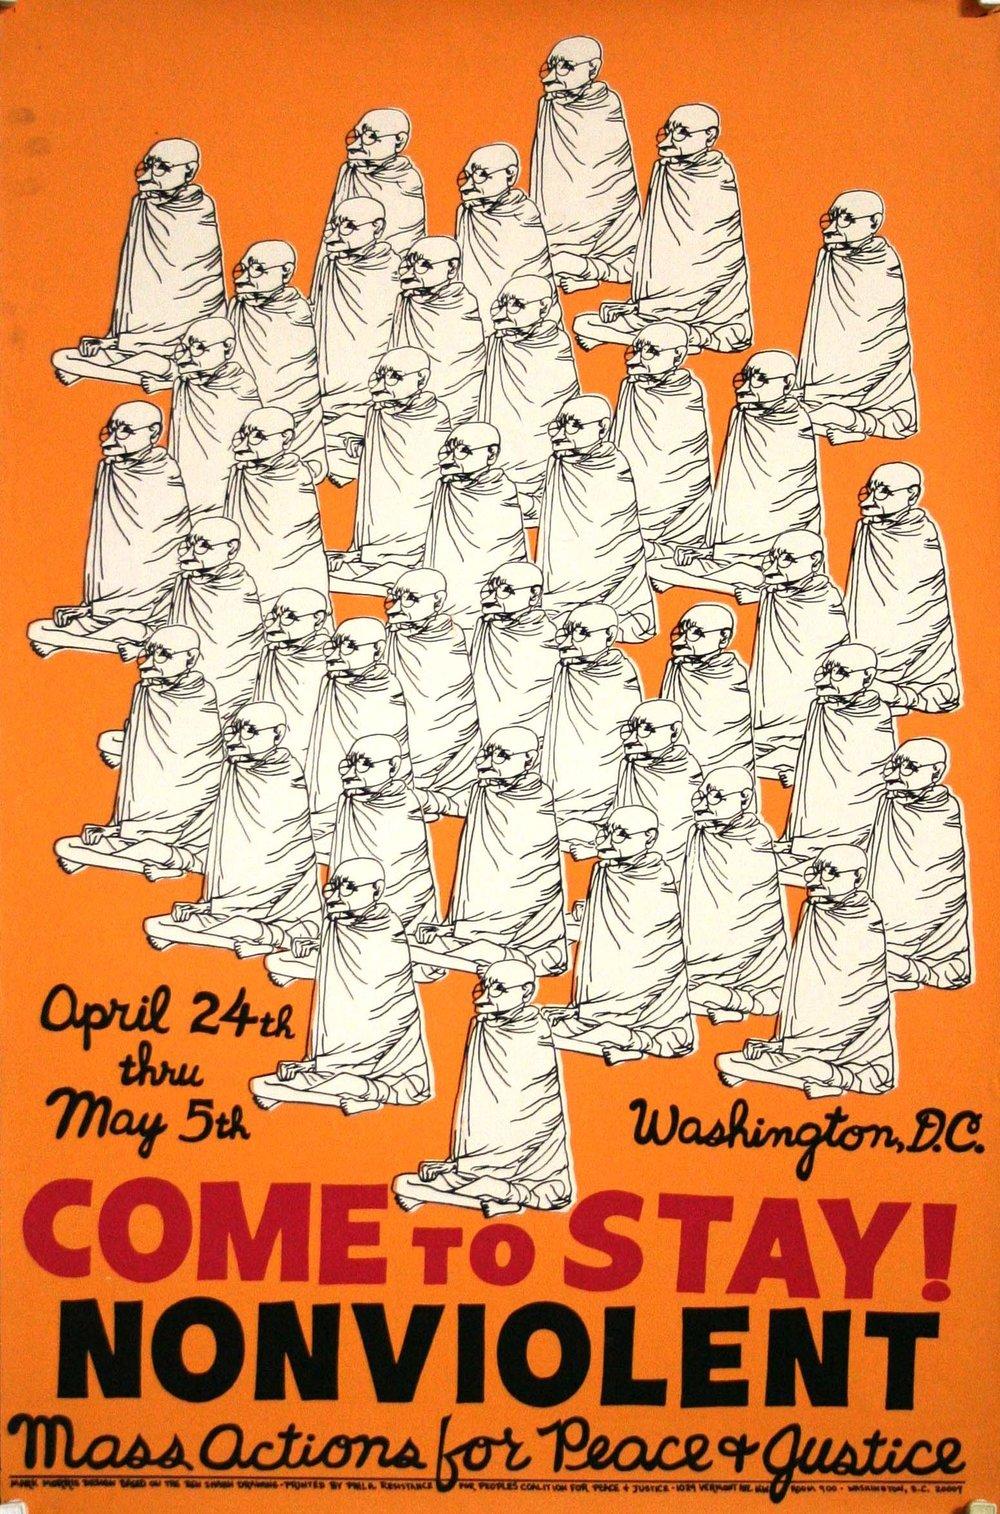 Mayday demonstration poster, Washington DC (1971)